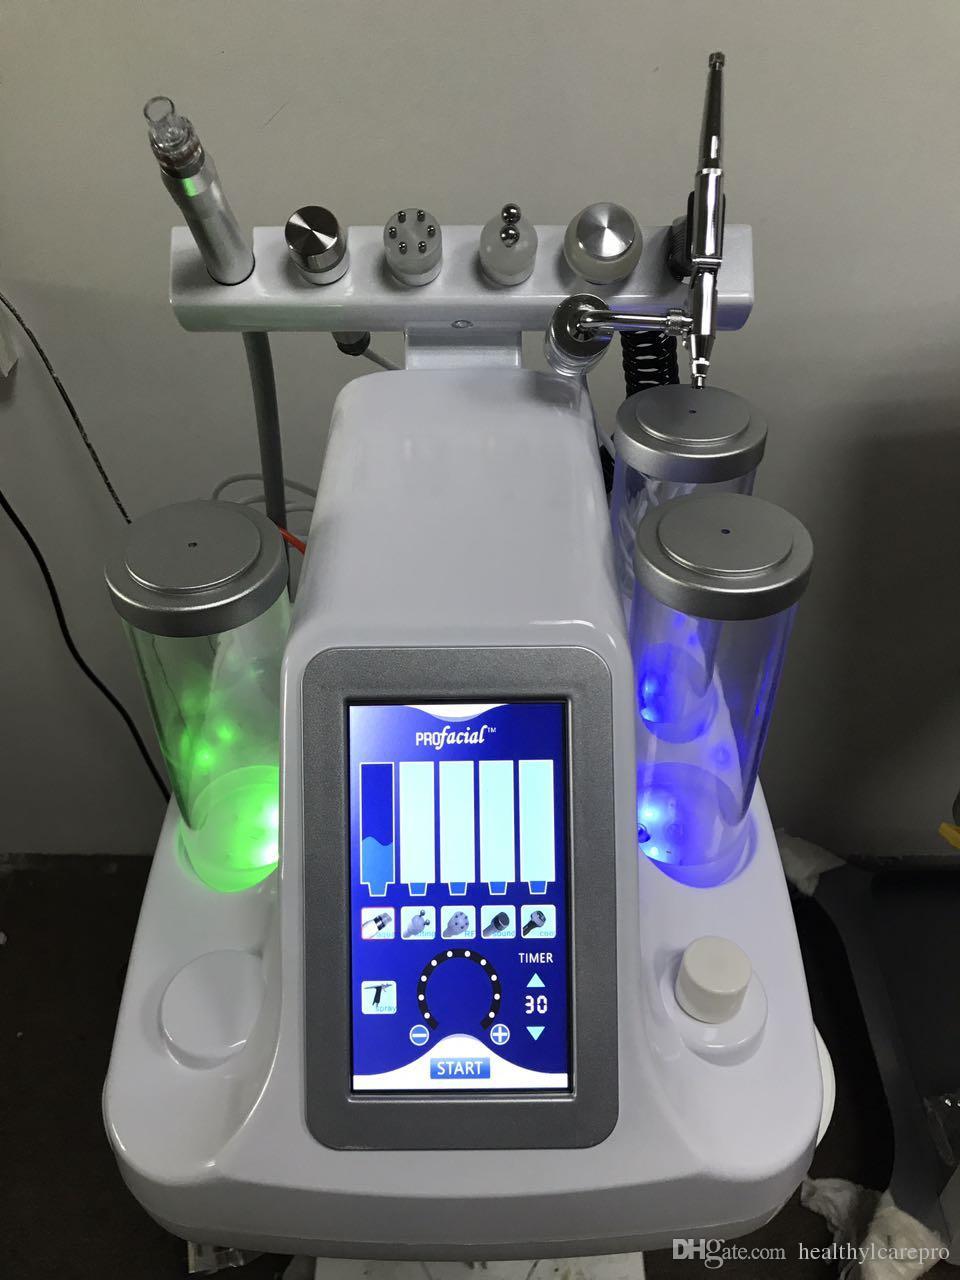 NEW 6 In 1 진공면 세정 Hydro Dermabrasion 물 산소 제트 필링 기계 진공 세제 클리너 얼굴 미용 장비